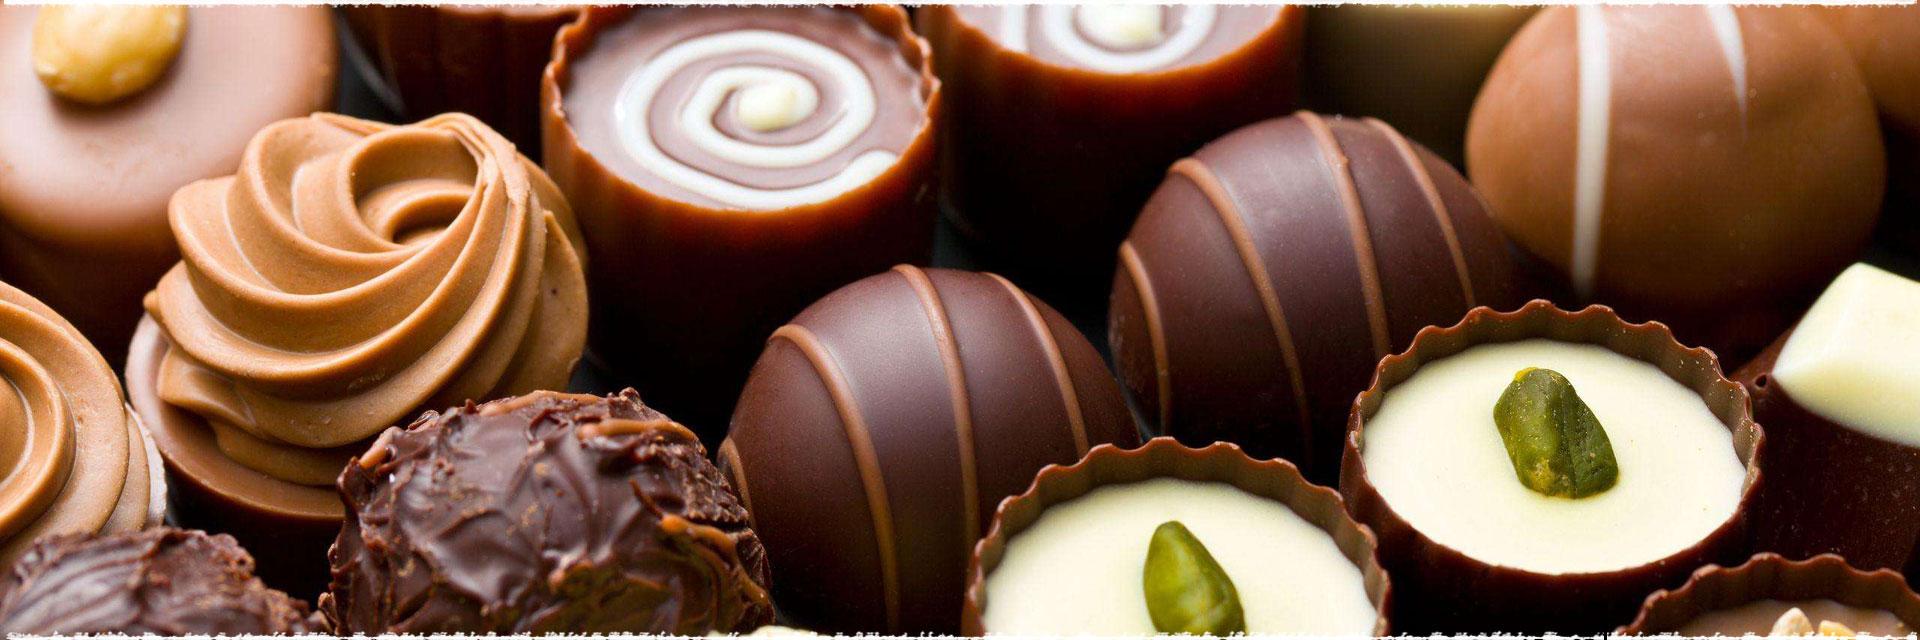 Mousse chocolat & thé vert & aquafaba « Végane »